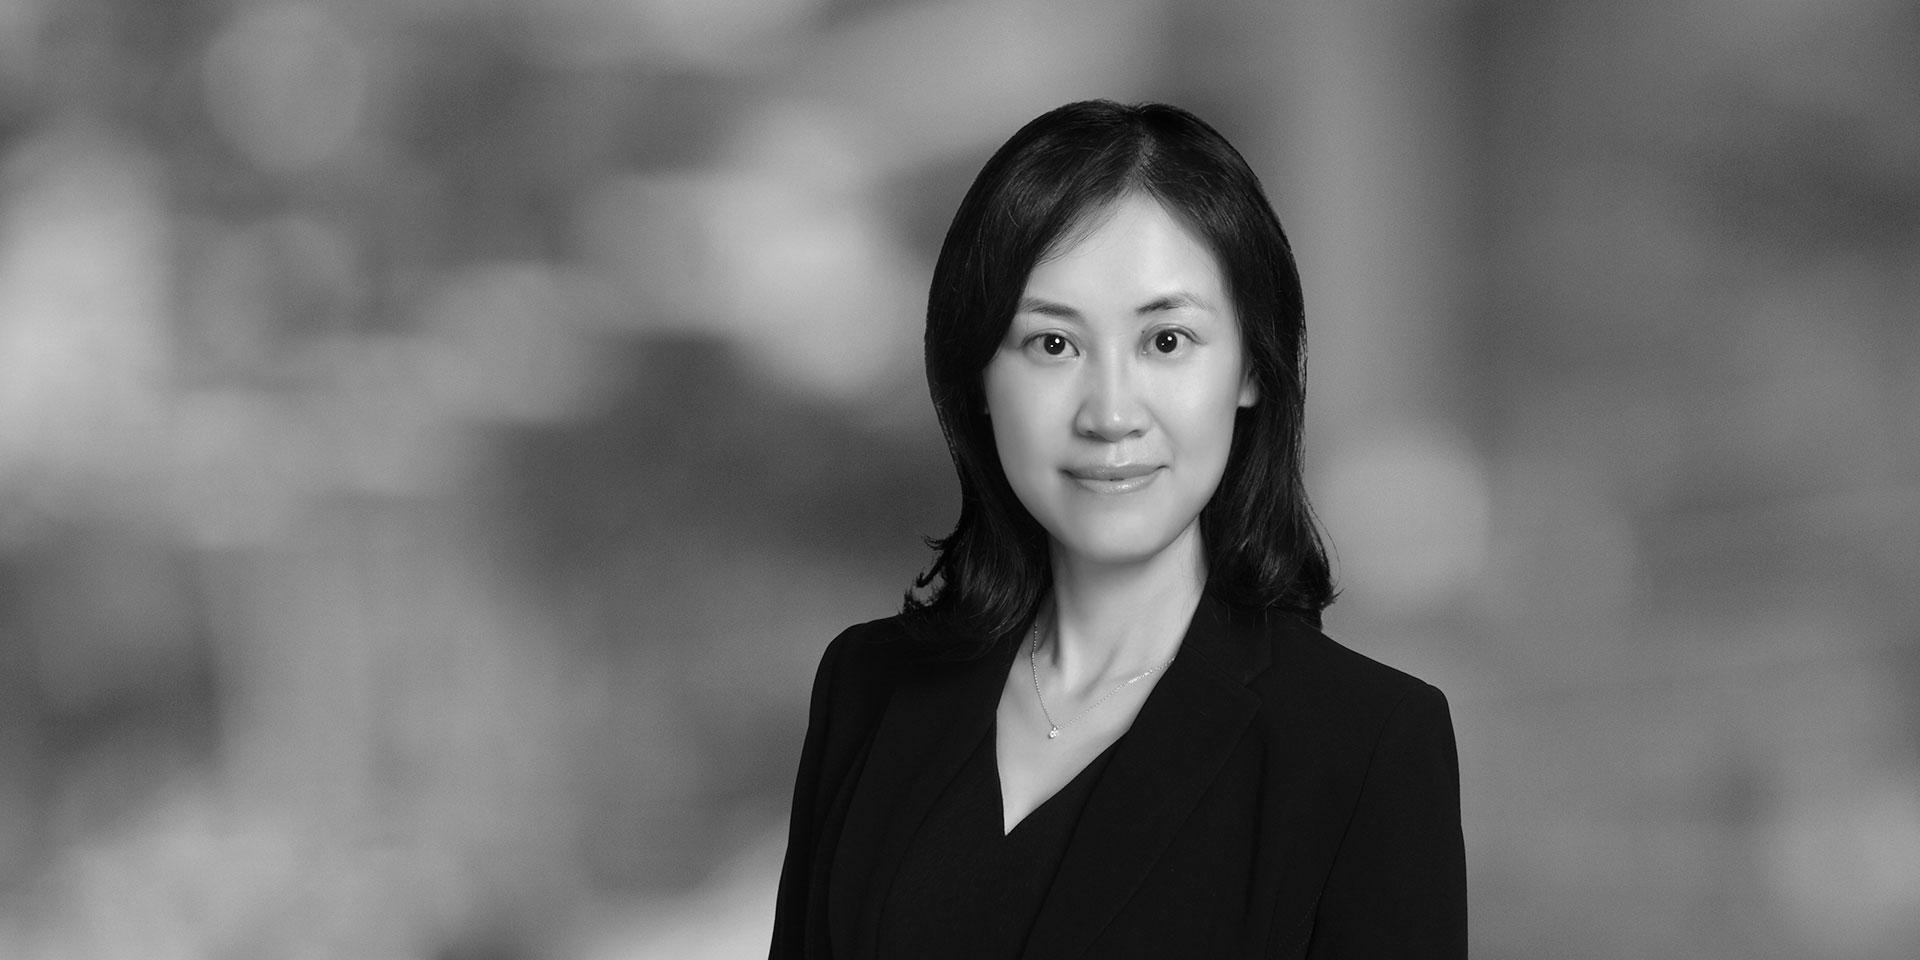 Bingna Guo